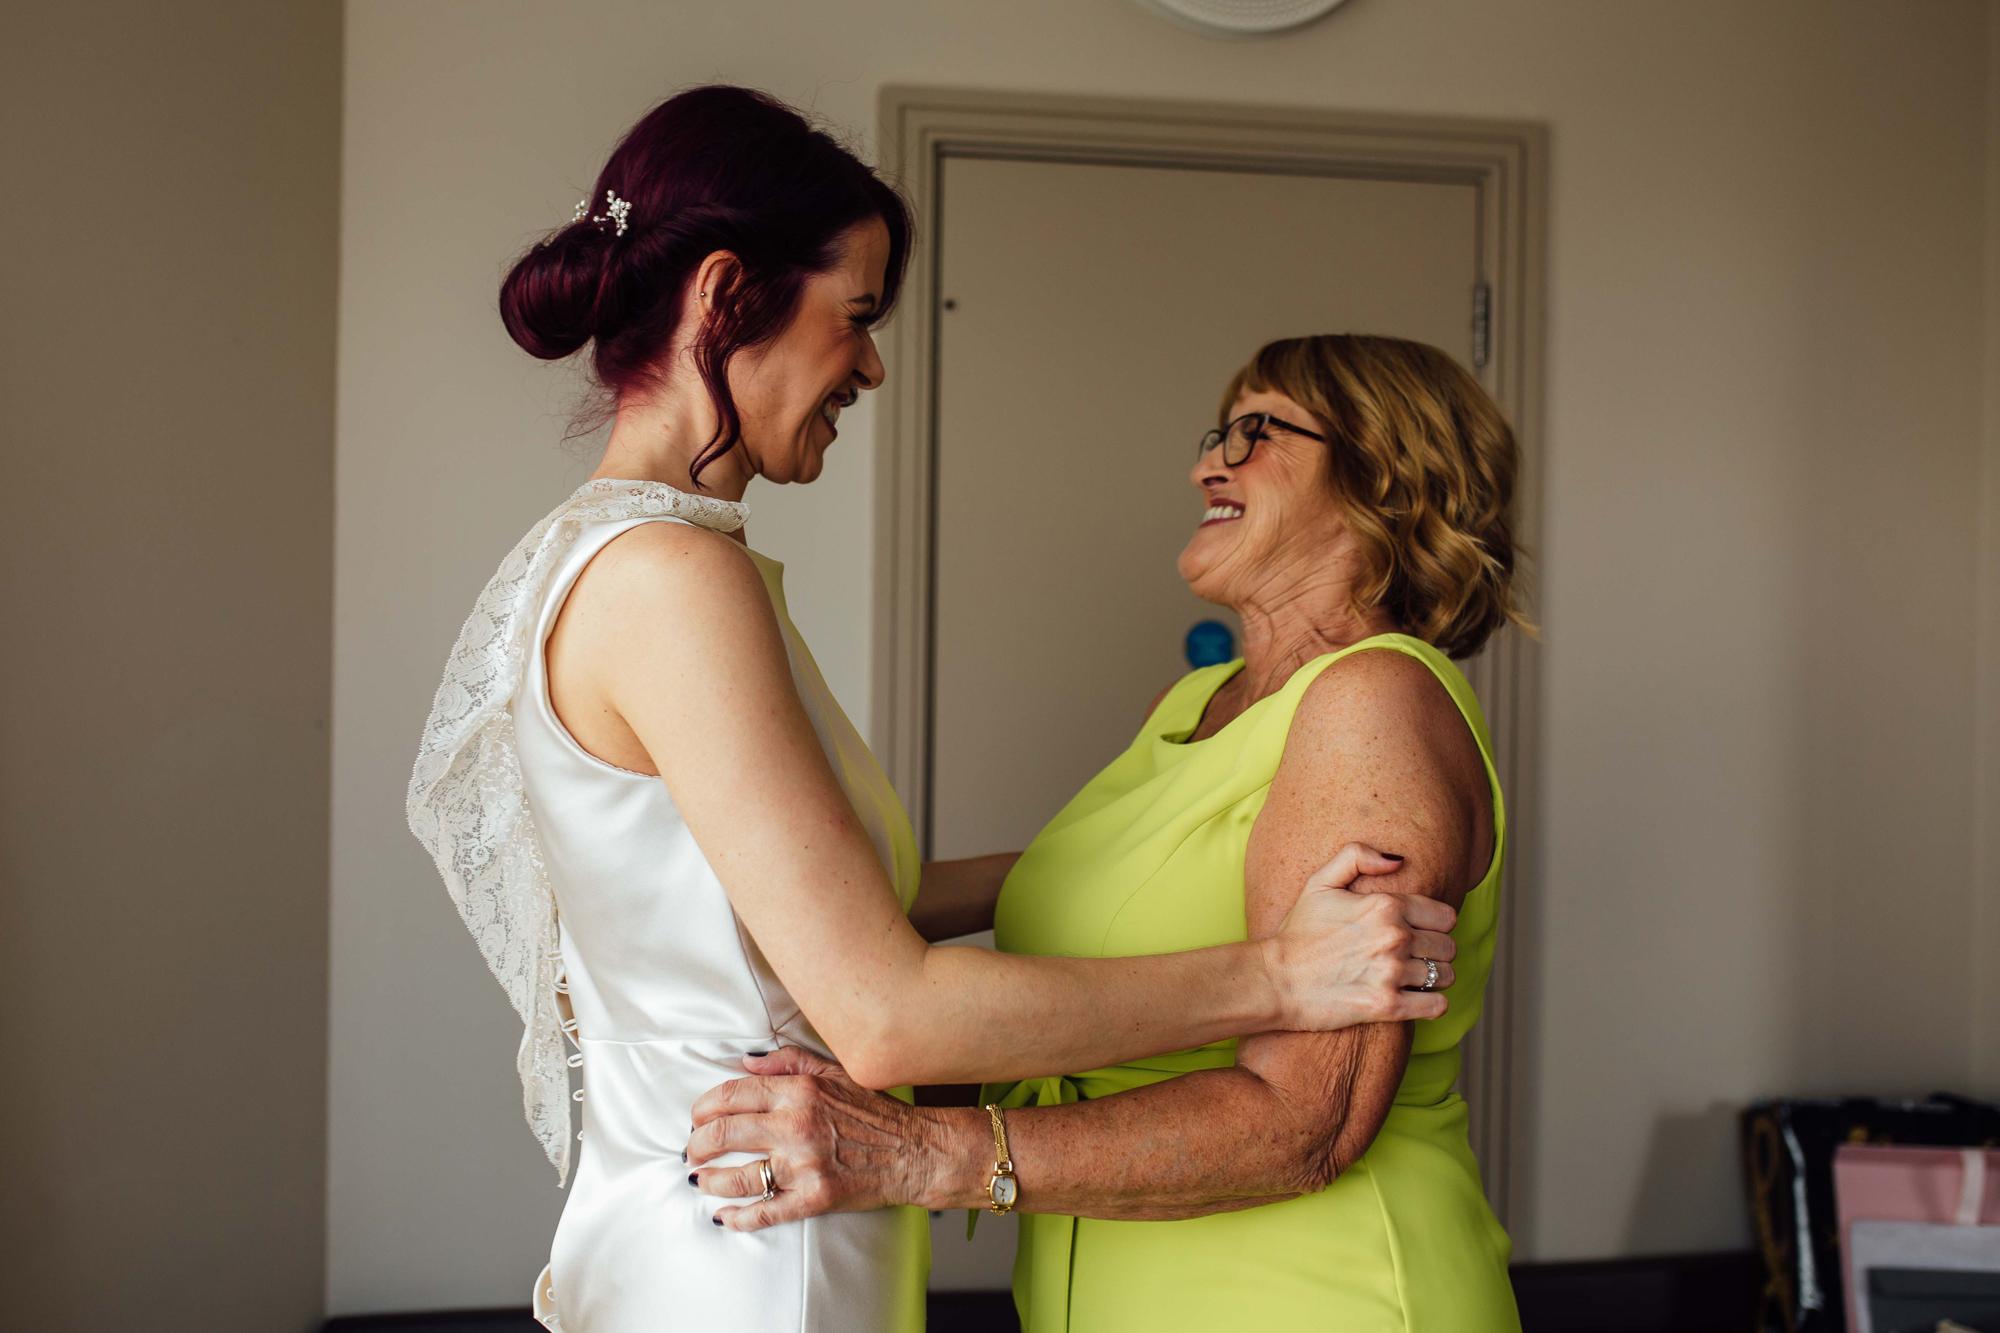 Sarah-Honeysuckle-Bias-Cut-Silk-Vintage-Inspired-Wedding-Gown-Sheffield-Wedding-Kate-Beaumont-1.jpg